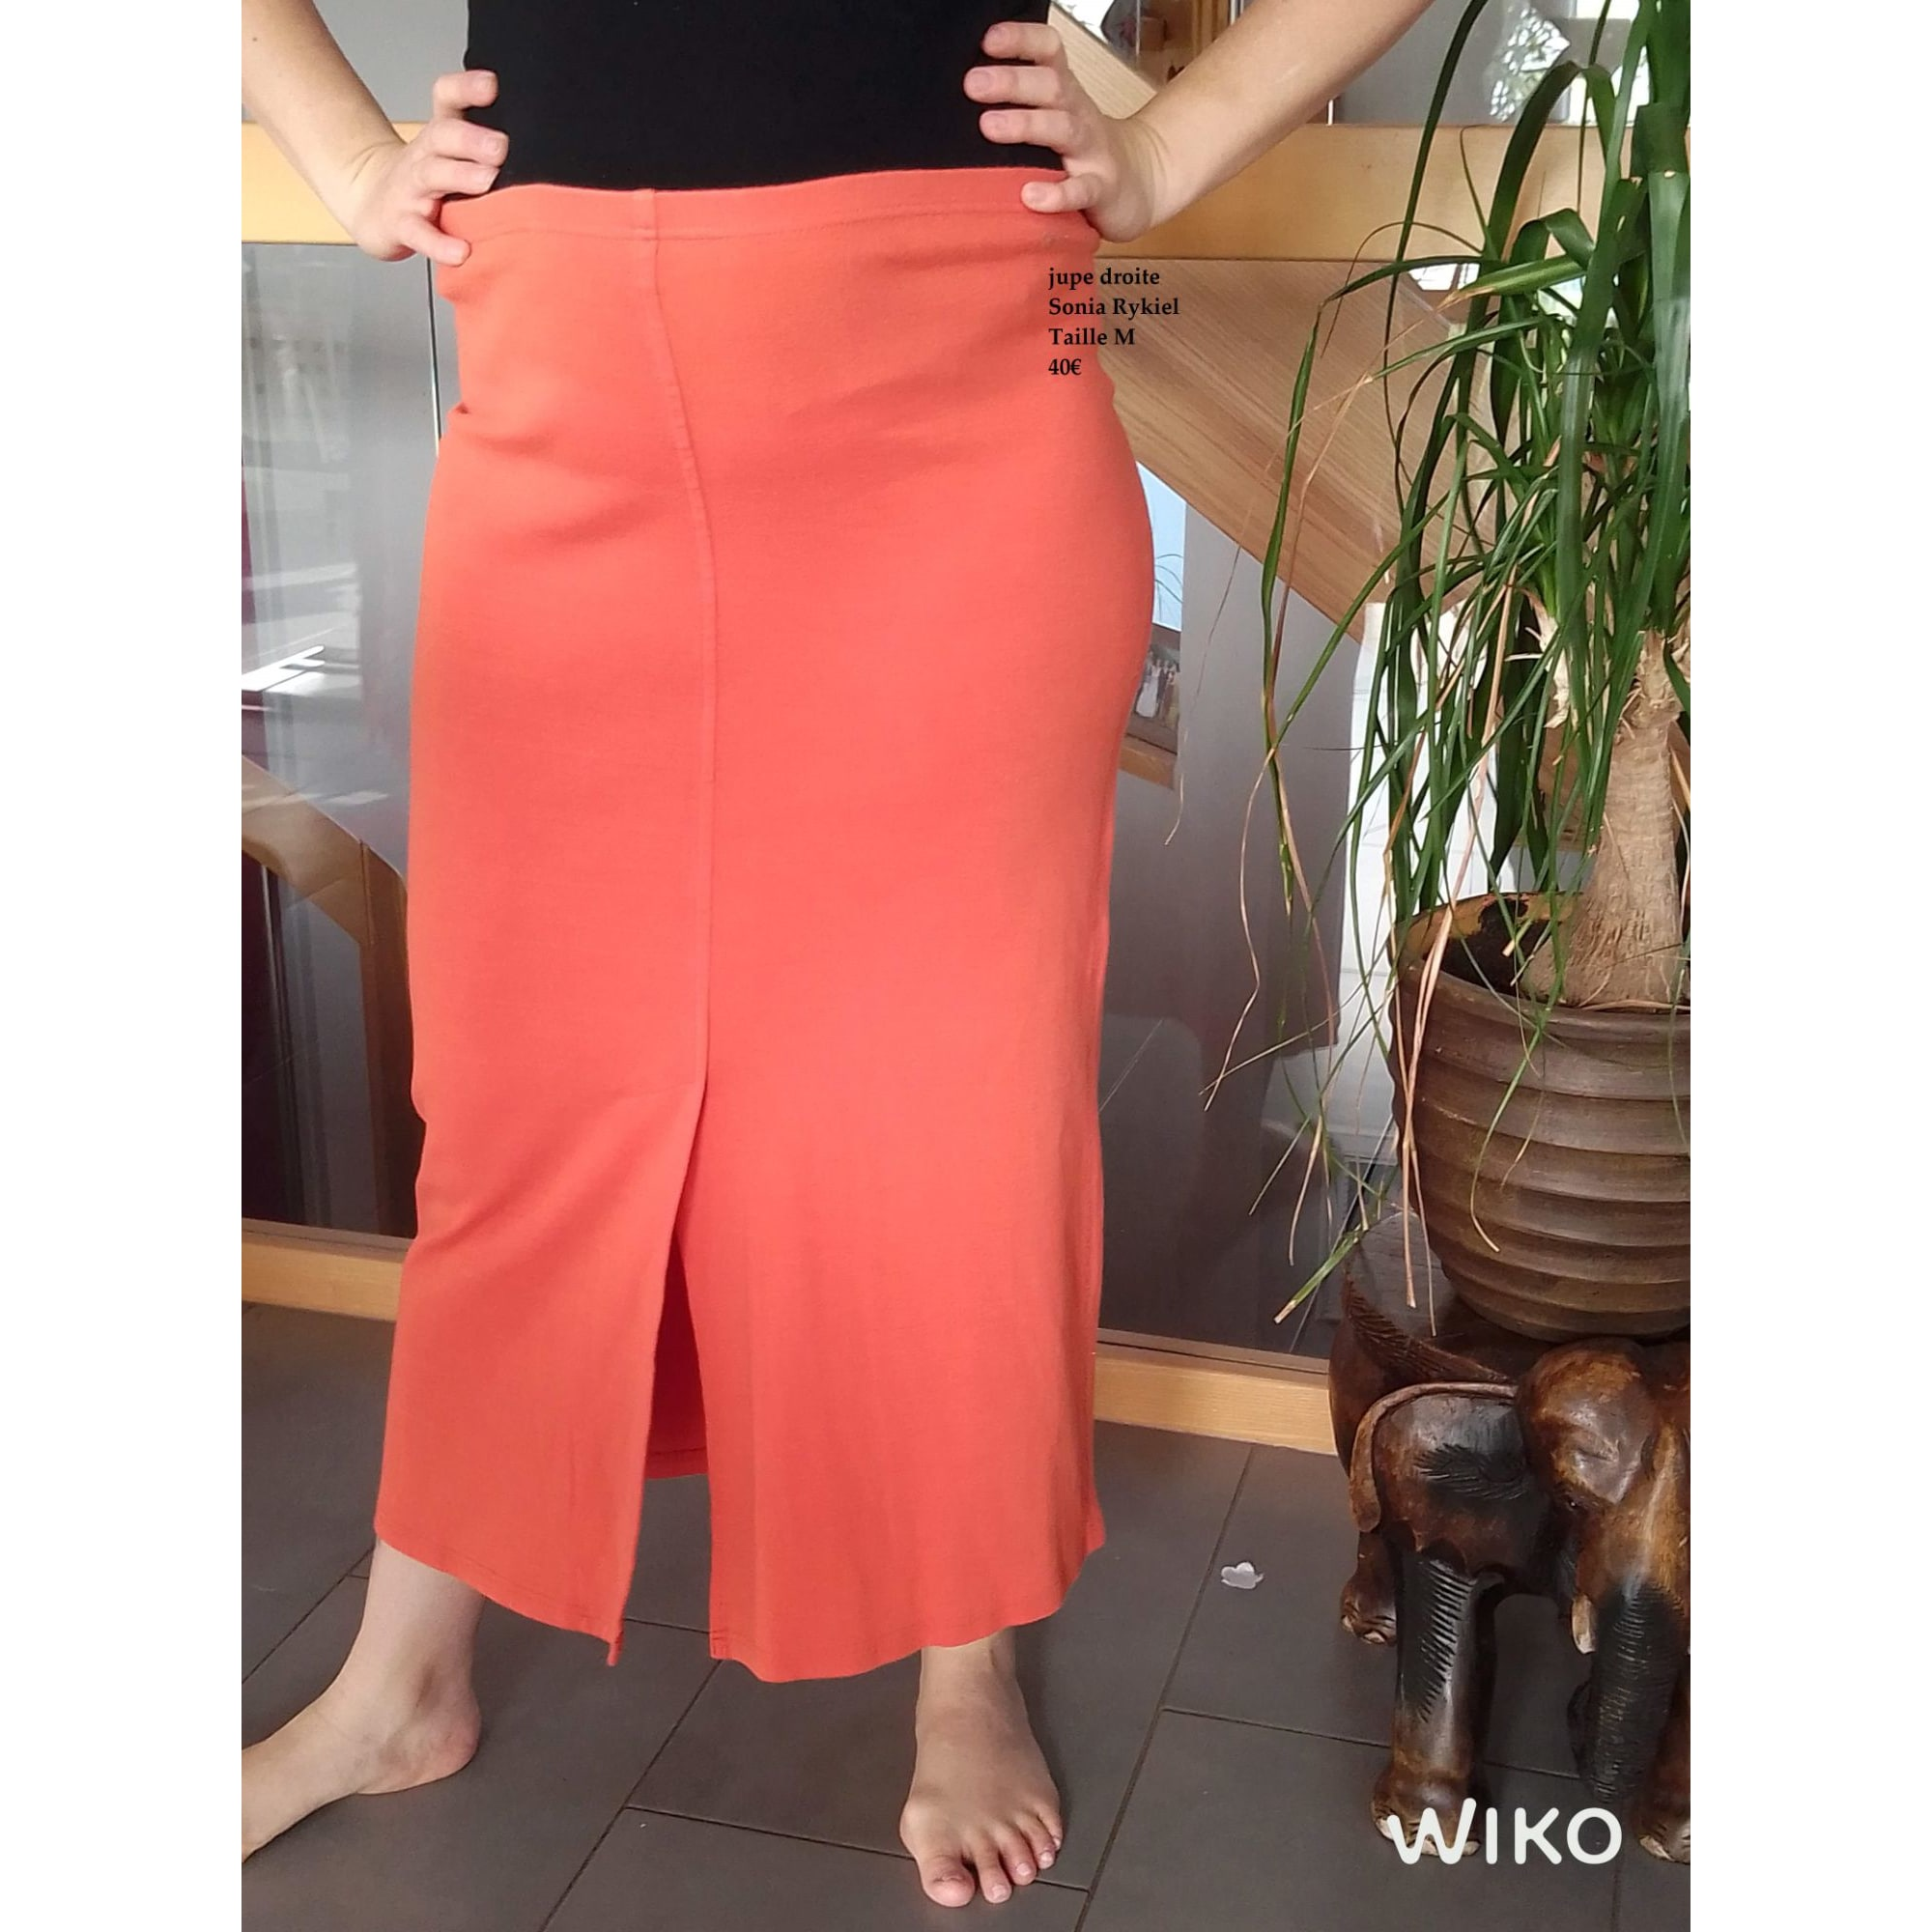 Jupe longue SONIA RYKIEL Orange